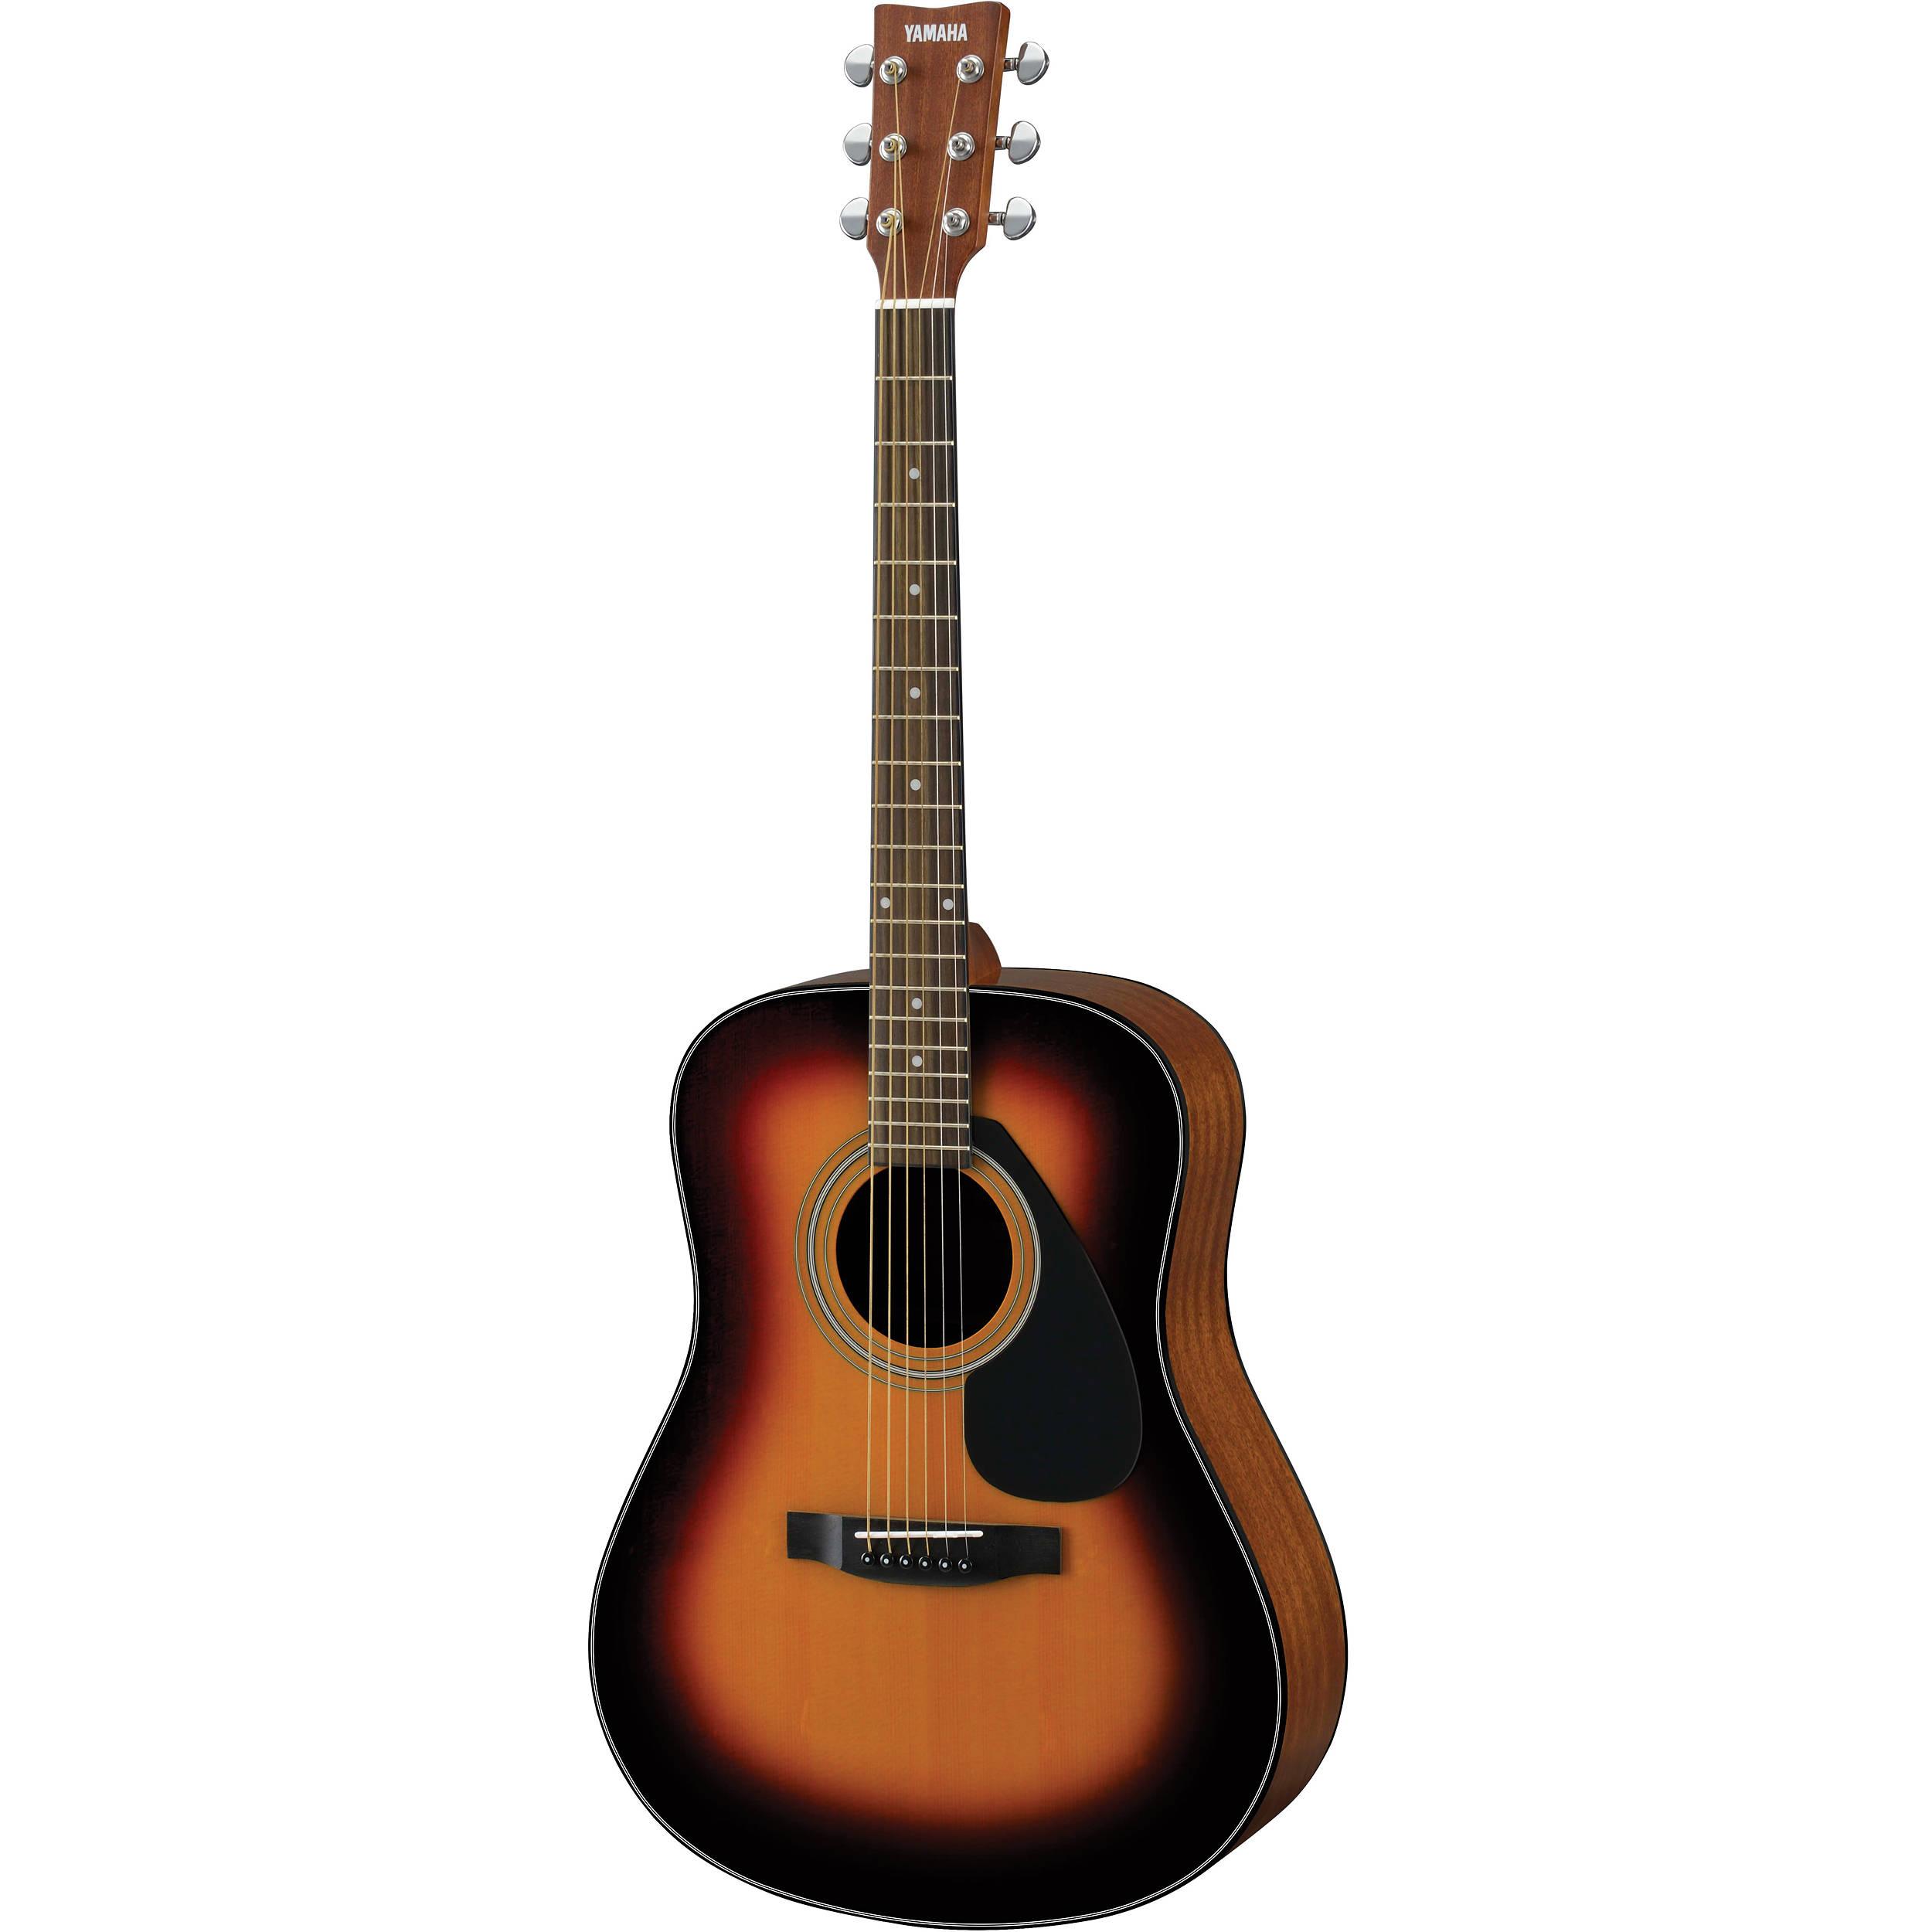 Yamaha Acoustic Guitar F Review